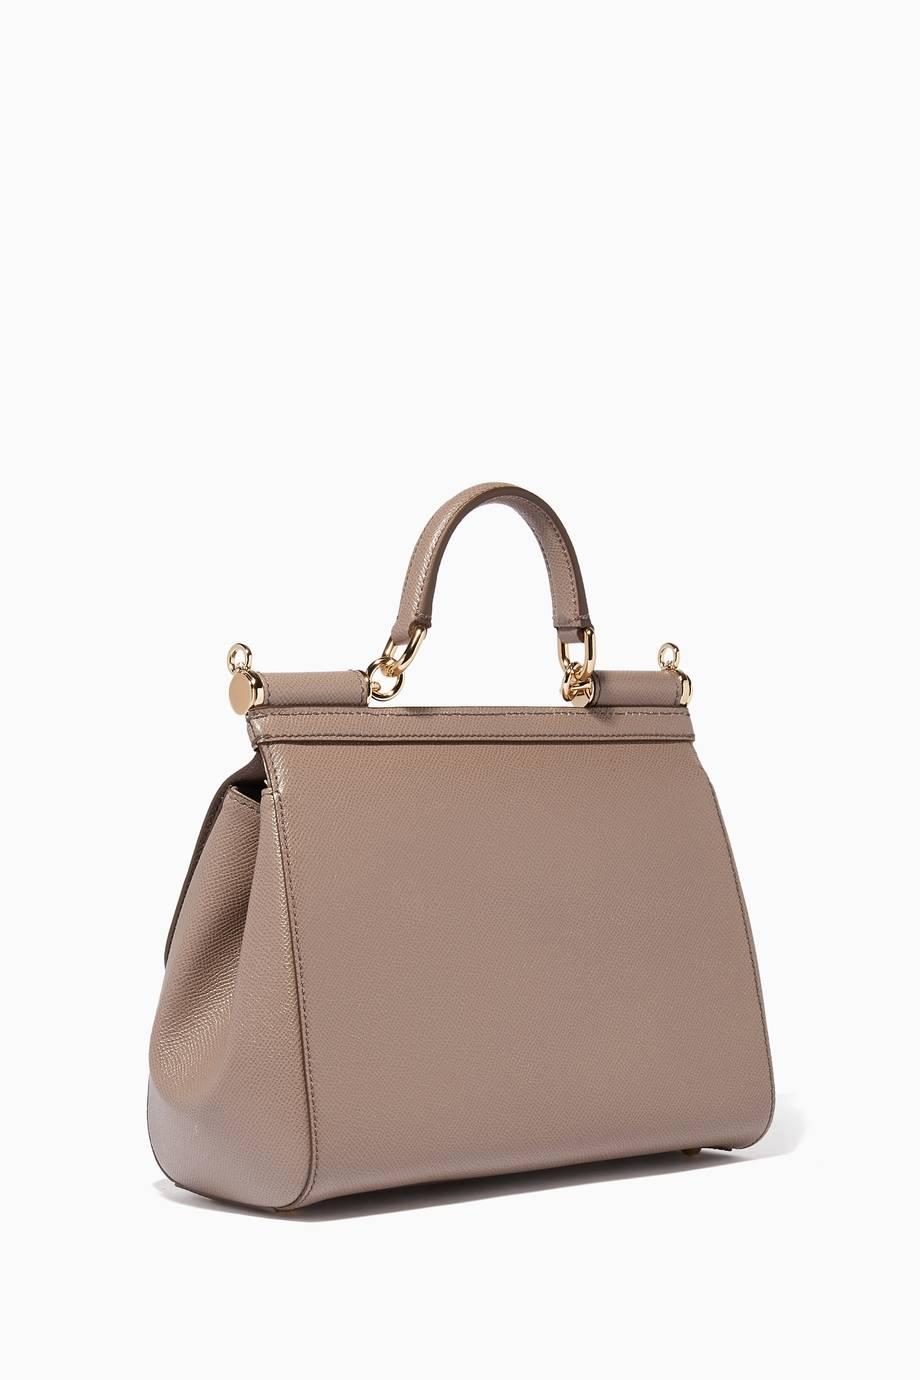 c946d32212 Shop Luxury Dolce   Gabbana Grey Medium Dauphine Leather Miss ...